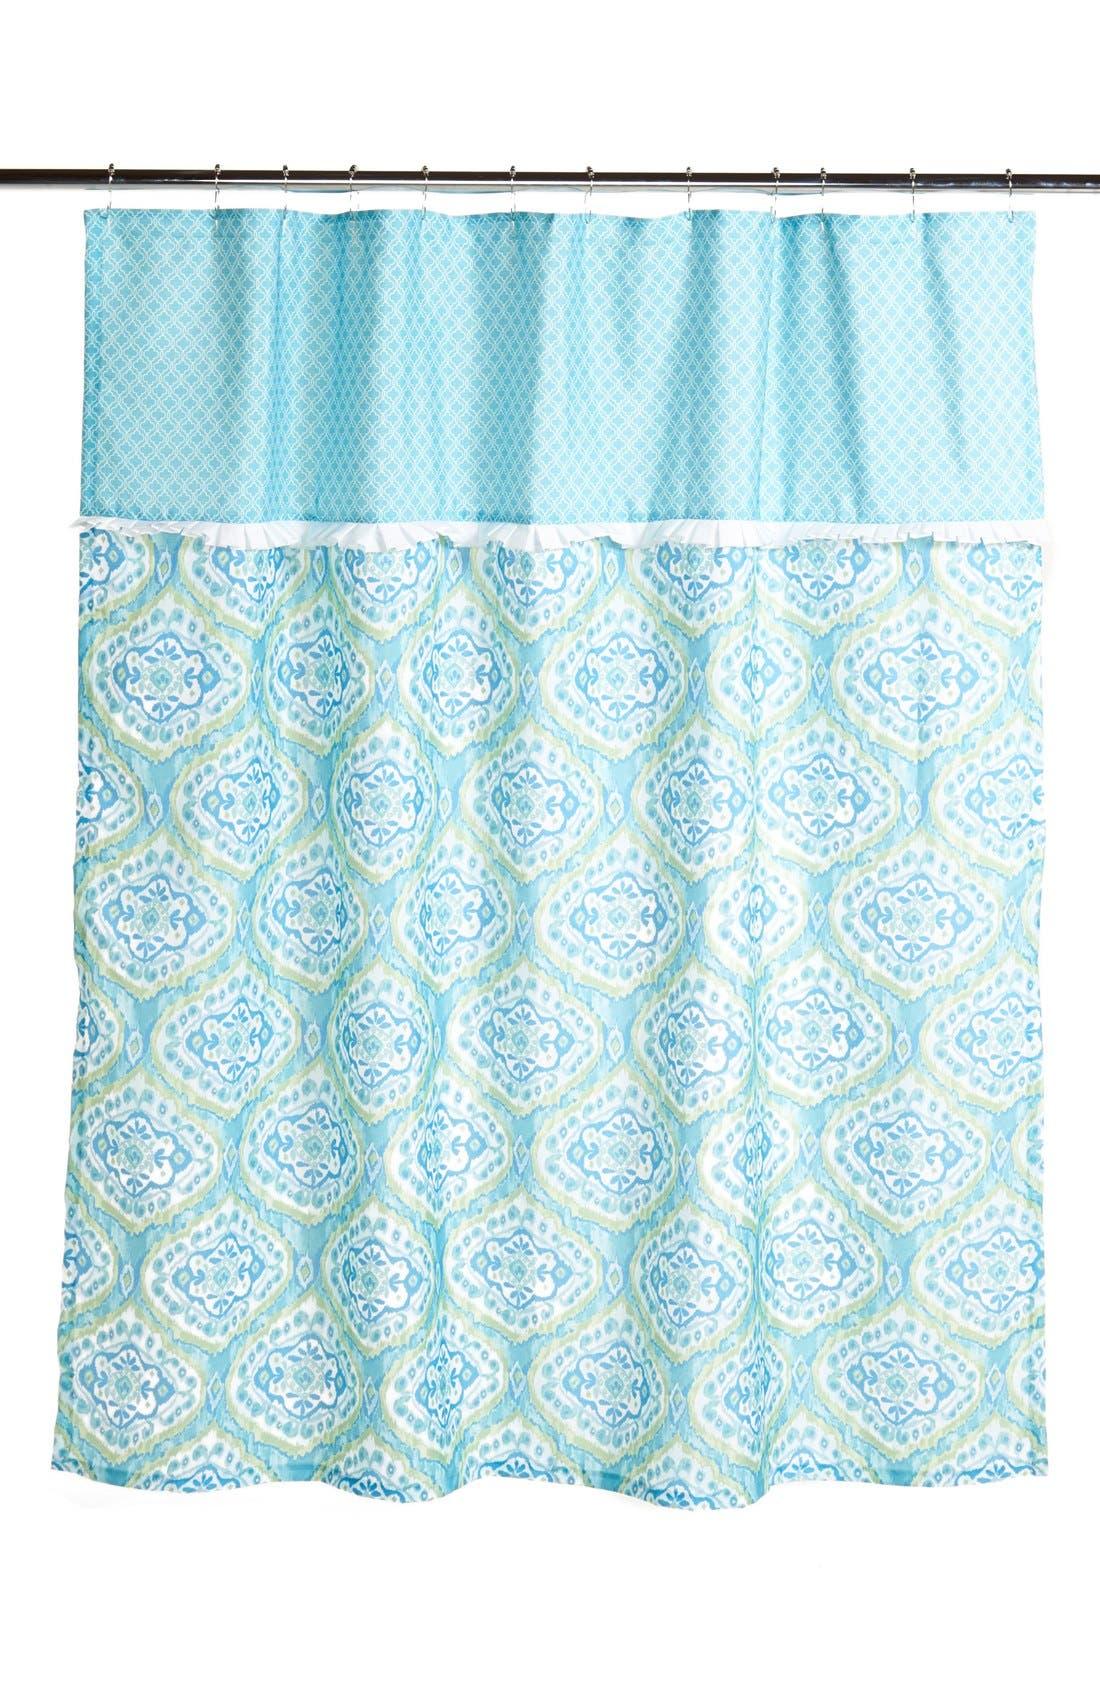 Main Image - Dena Home 'Tangiers' Shower Curtain